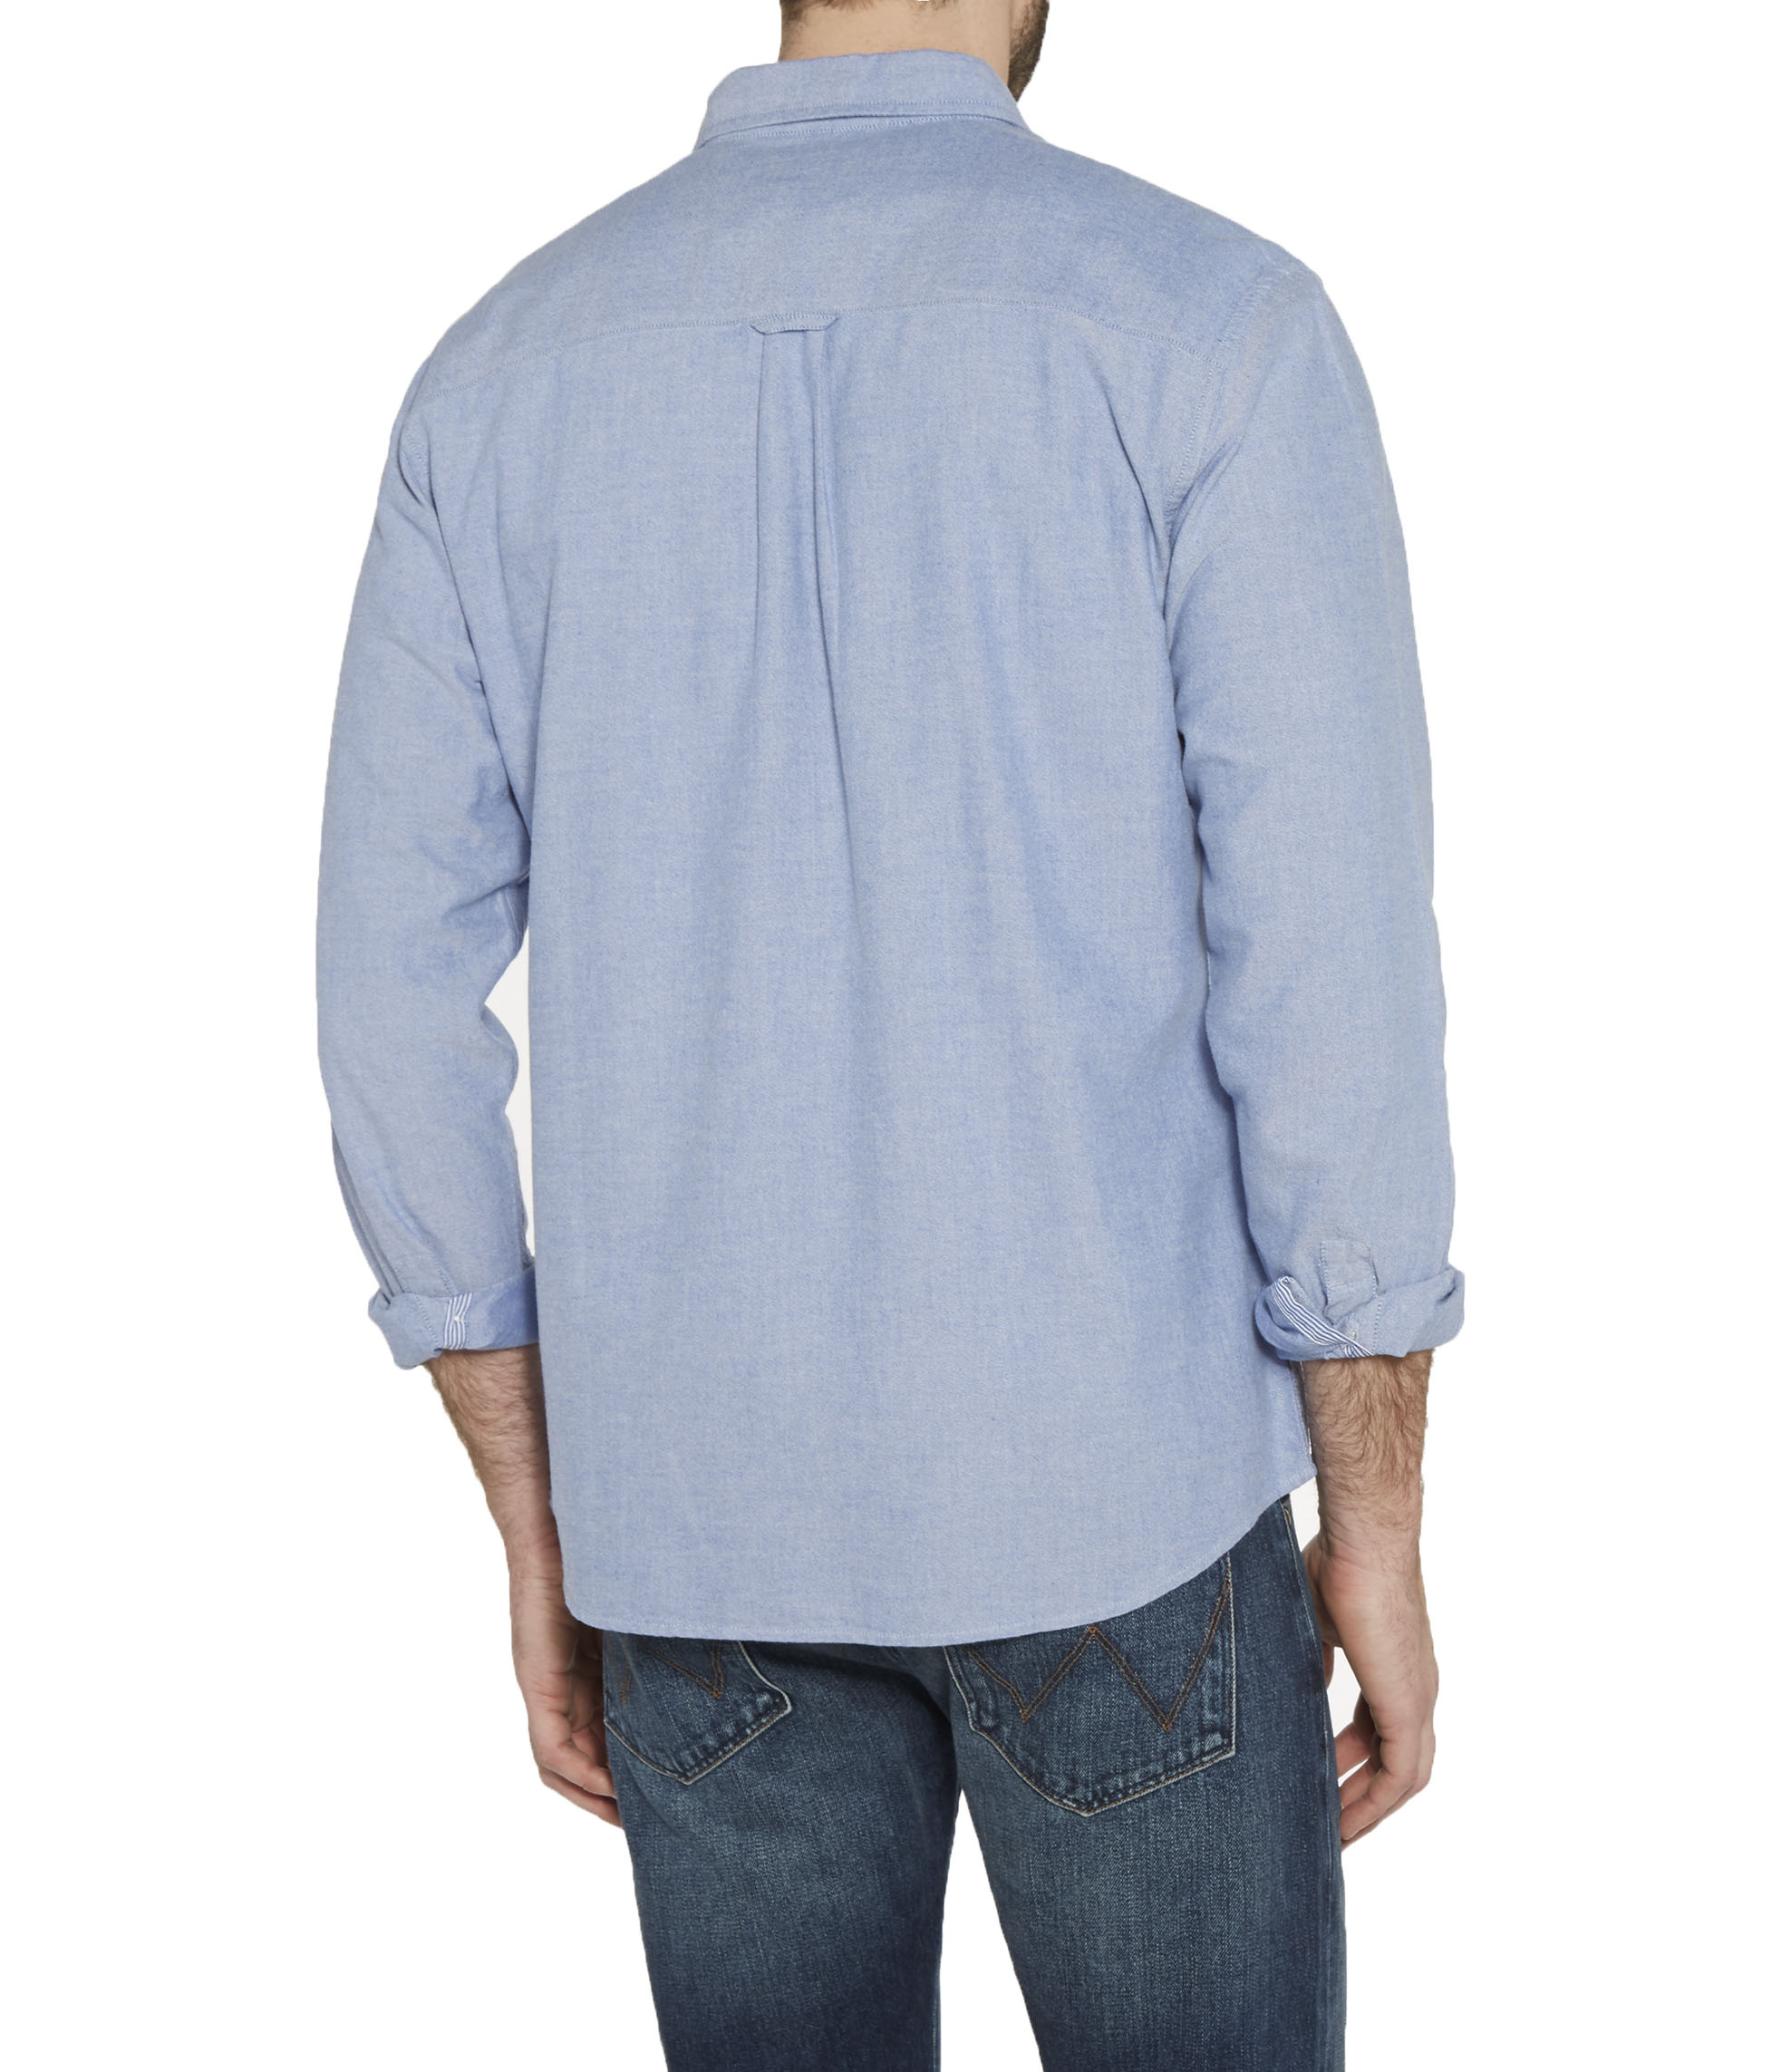 Wrangler Men s Cotton Oxford Shirt Regular Fit Long Sleeve Button Down  Collar 287a1c6140b